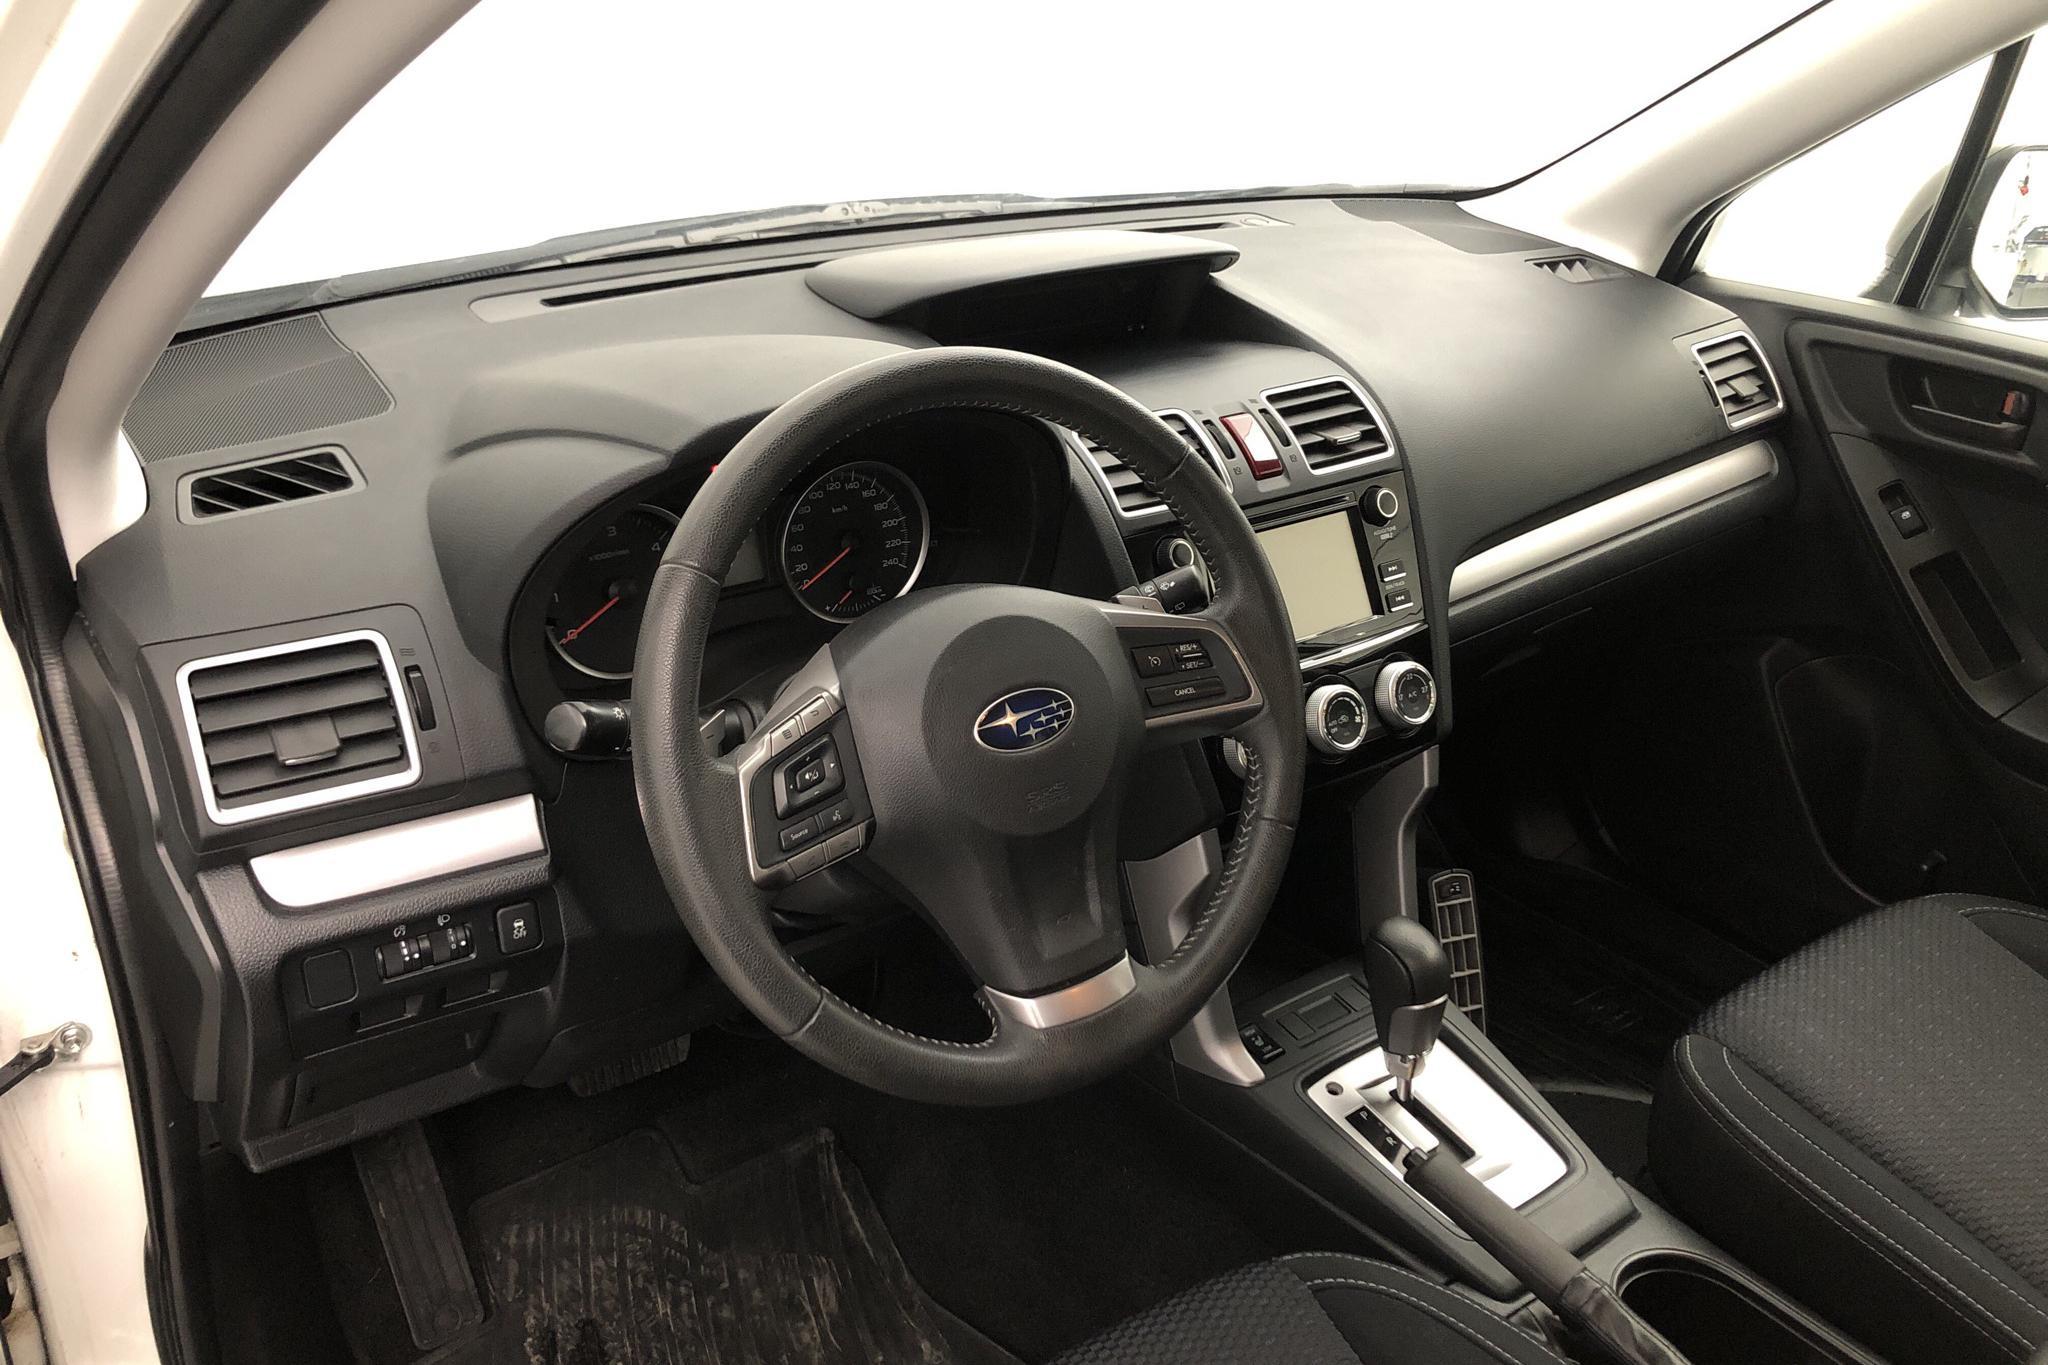 Subaru Forester 2.0D (147hk) - 34 990 km - Automatic - white - 2015